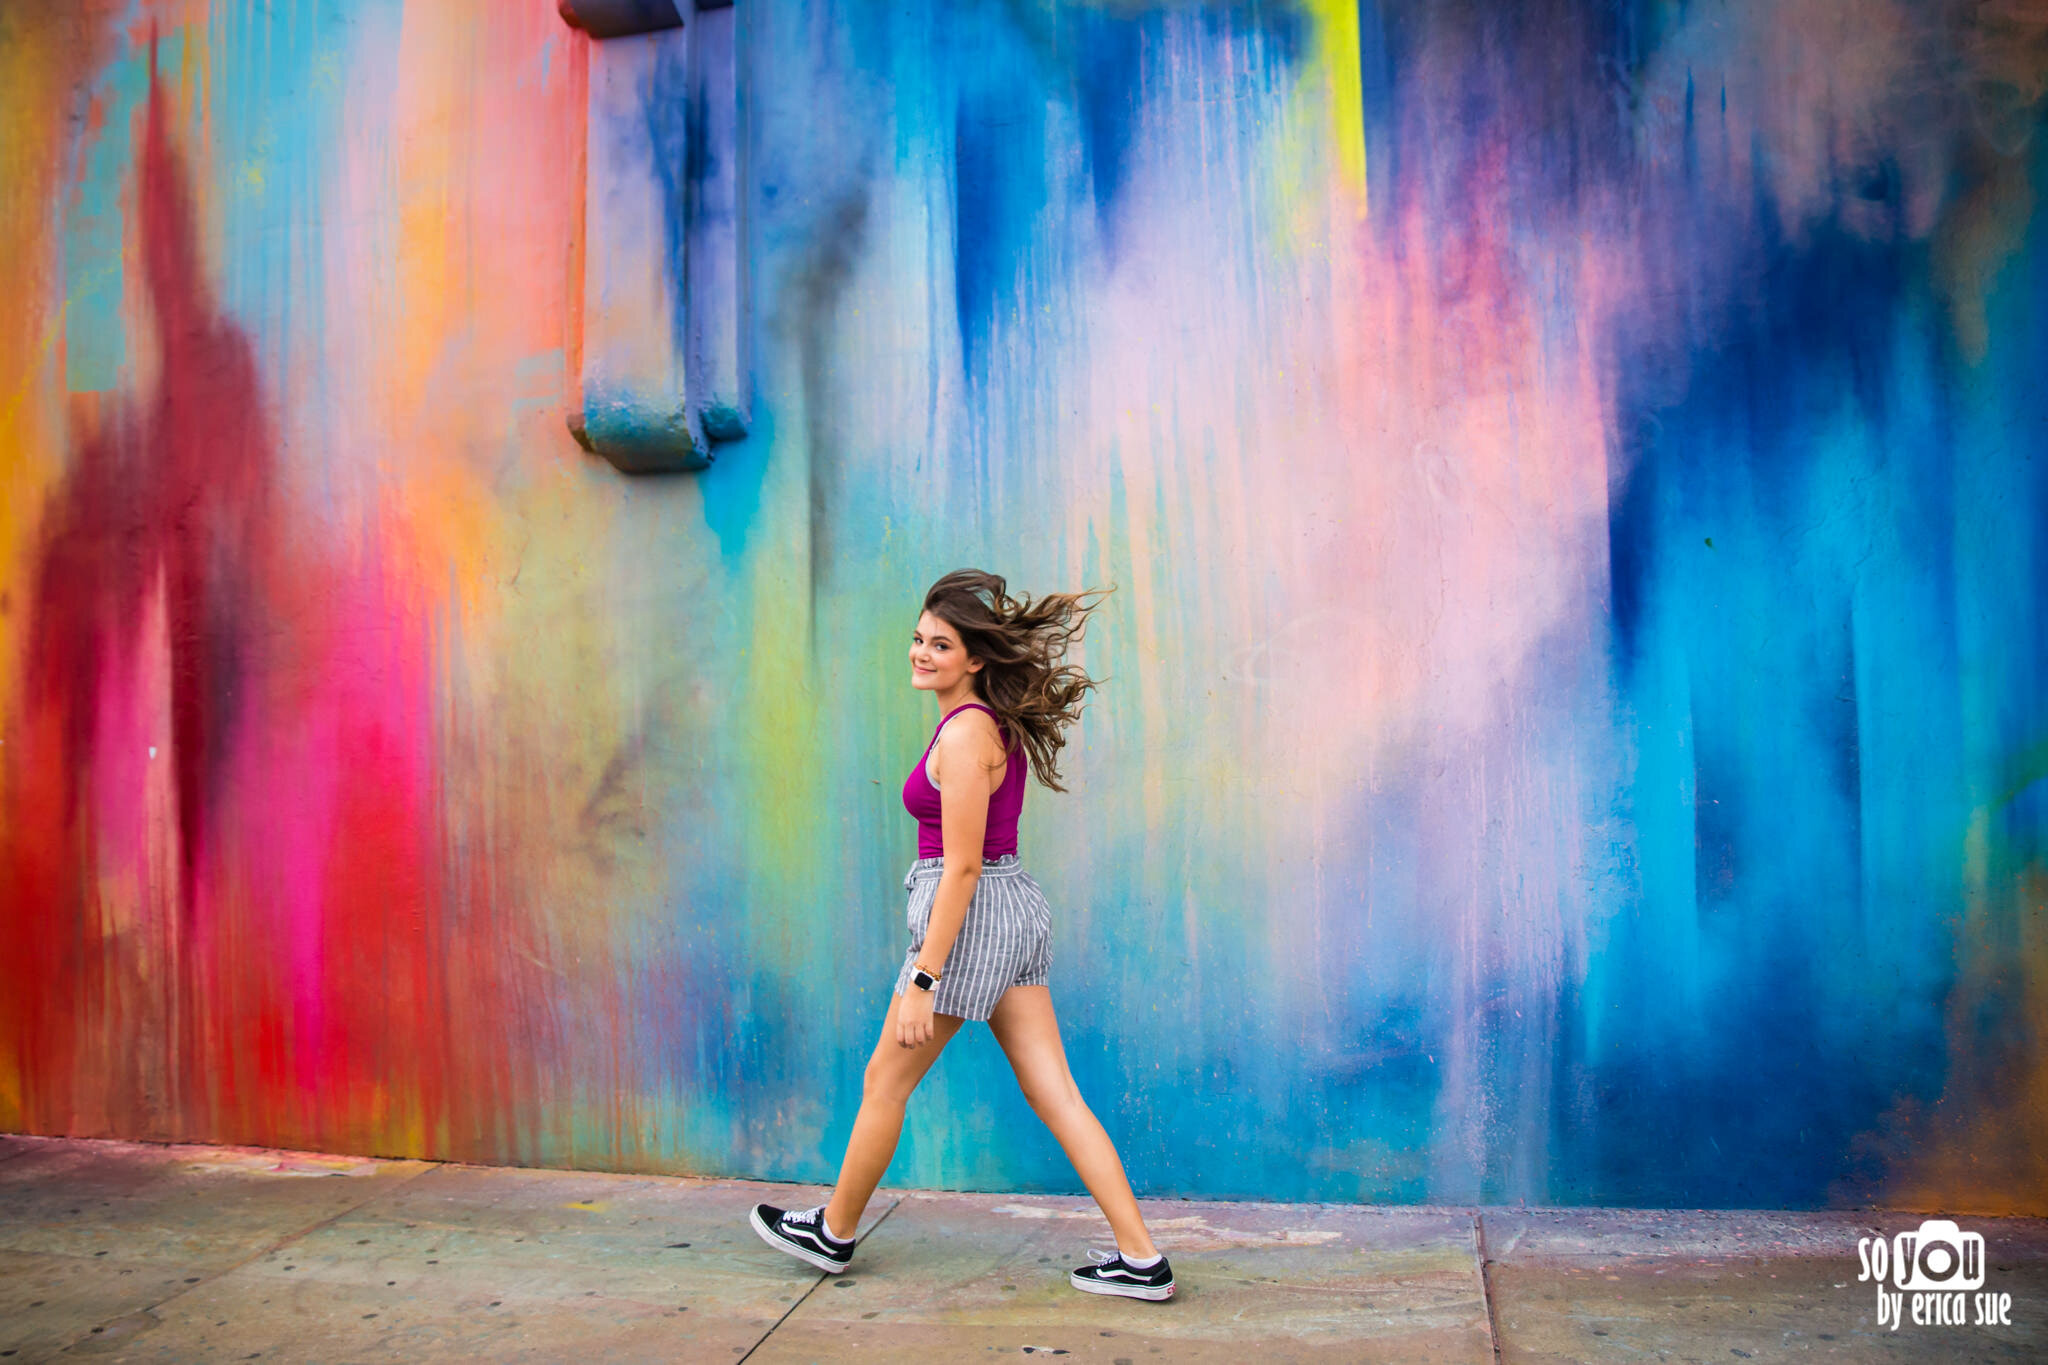 so-you-by-erica-sue-wynwood-miami-lifestyle-family-photographer-mitzvah-pre-shoot-0198.JPG